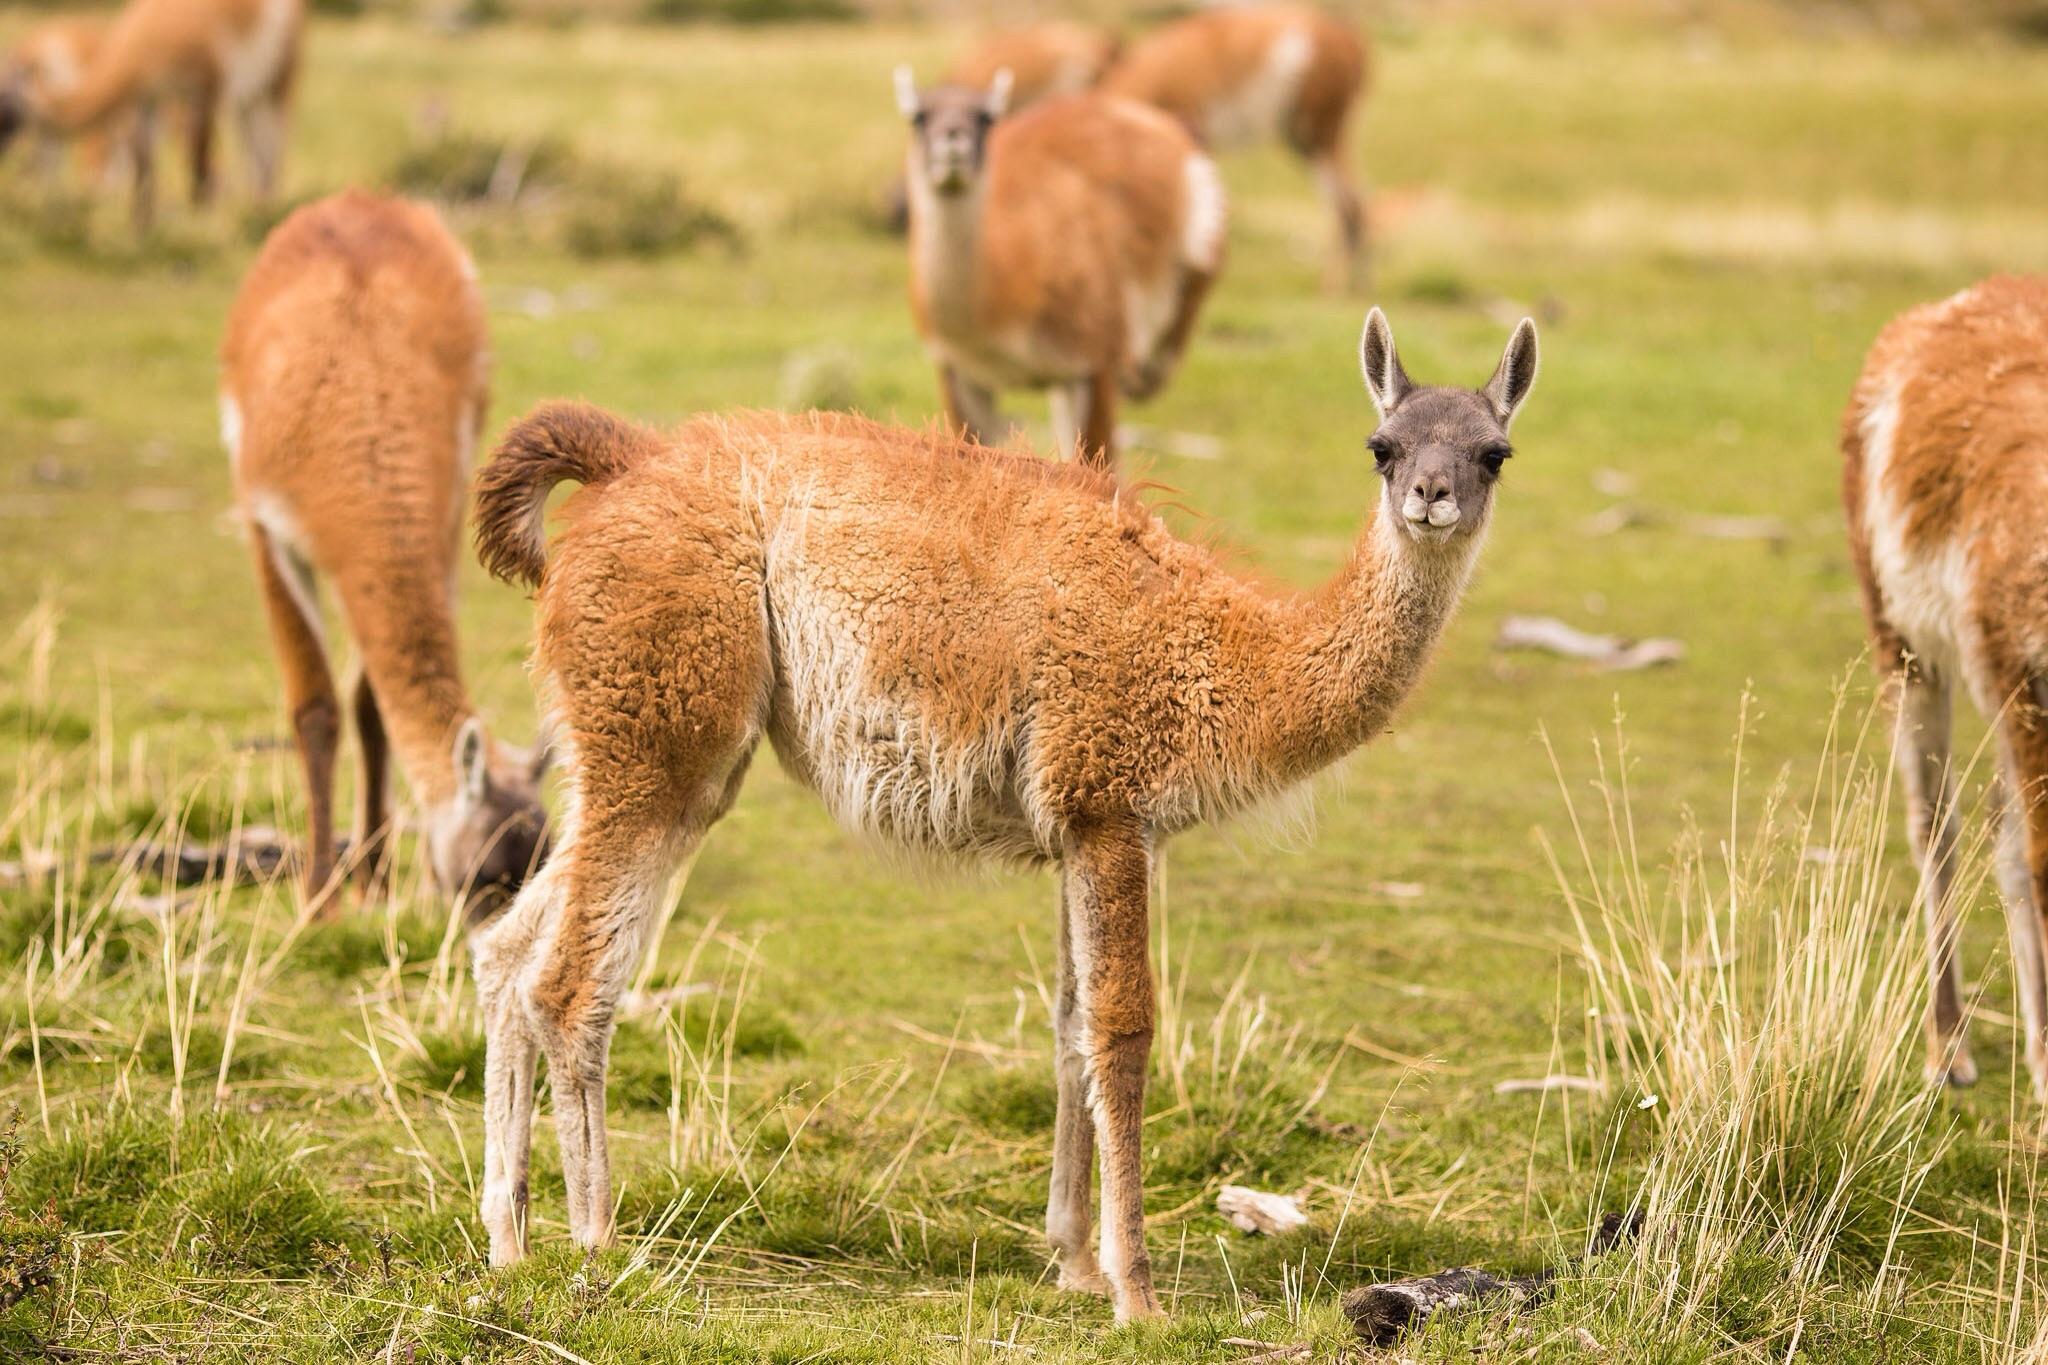 Wedding-Travellers-Overlanding-Destination-Wedding-Chile-Torres-del-Paine-guanaco-lama-llama-tres-torres-cute